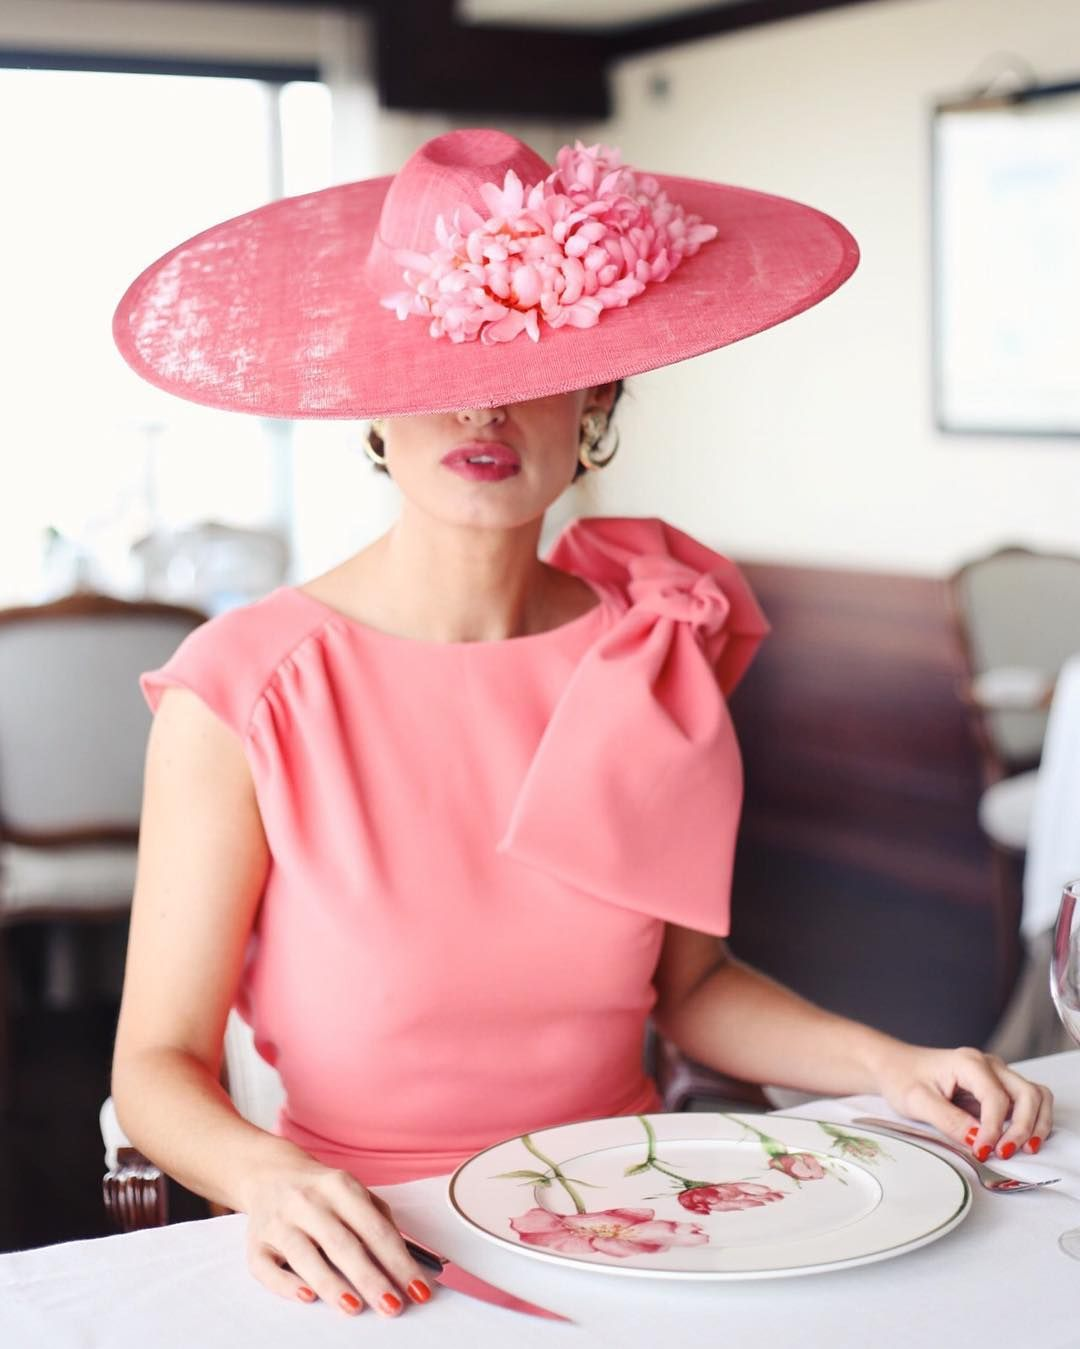 🌺🌺🌺 #realladieswearcherubina Vestido Texas coral & sombrero en www.cherubina.com